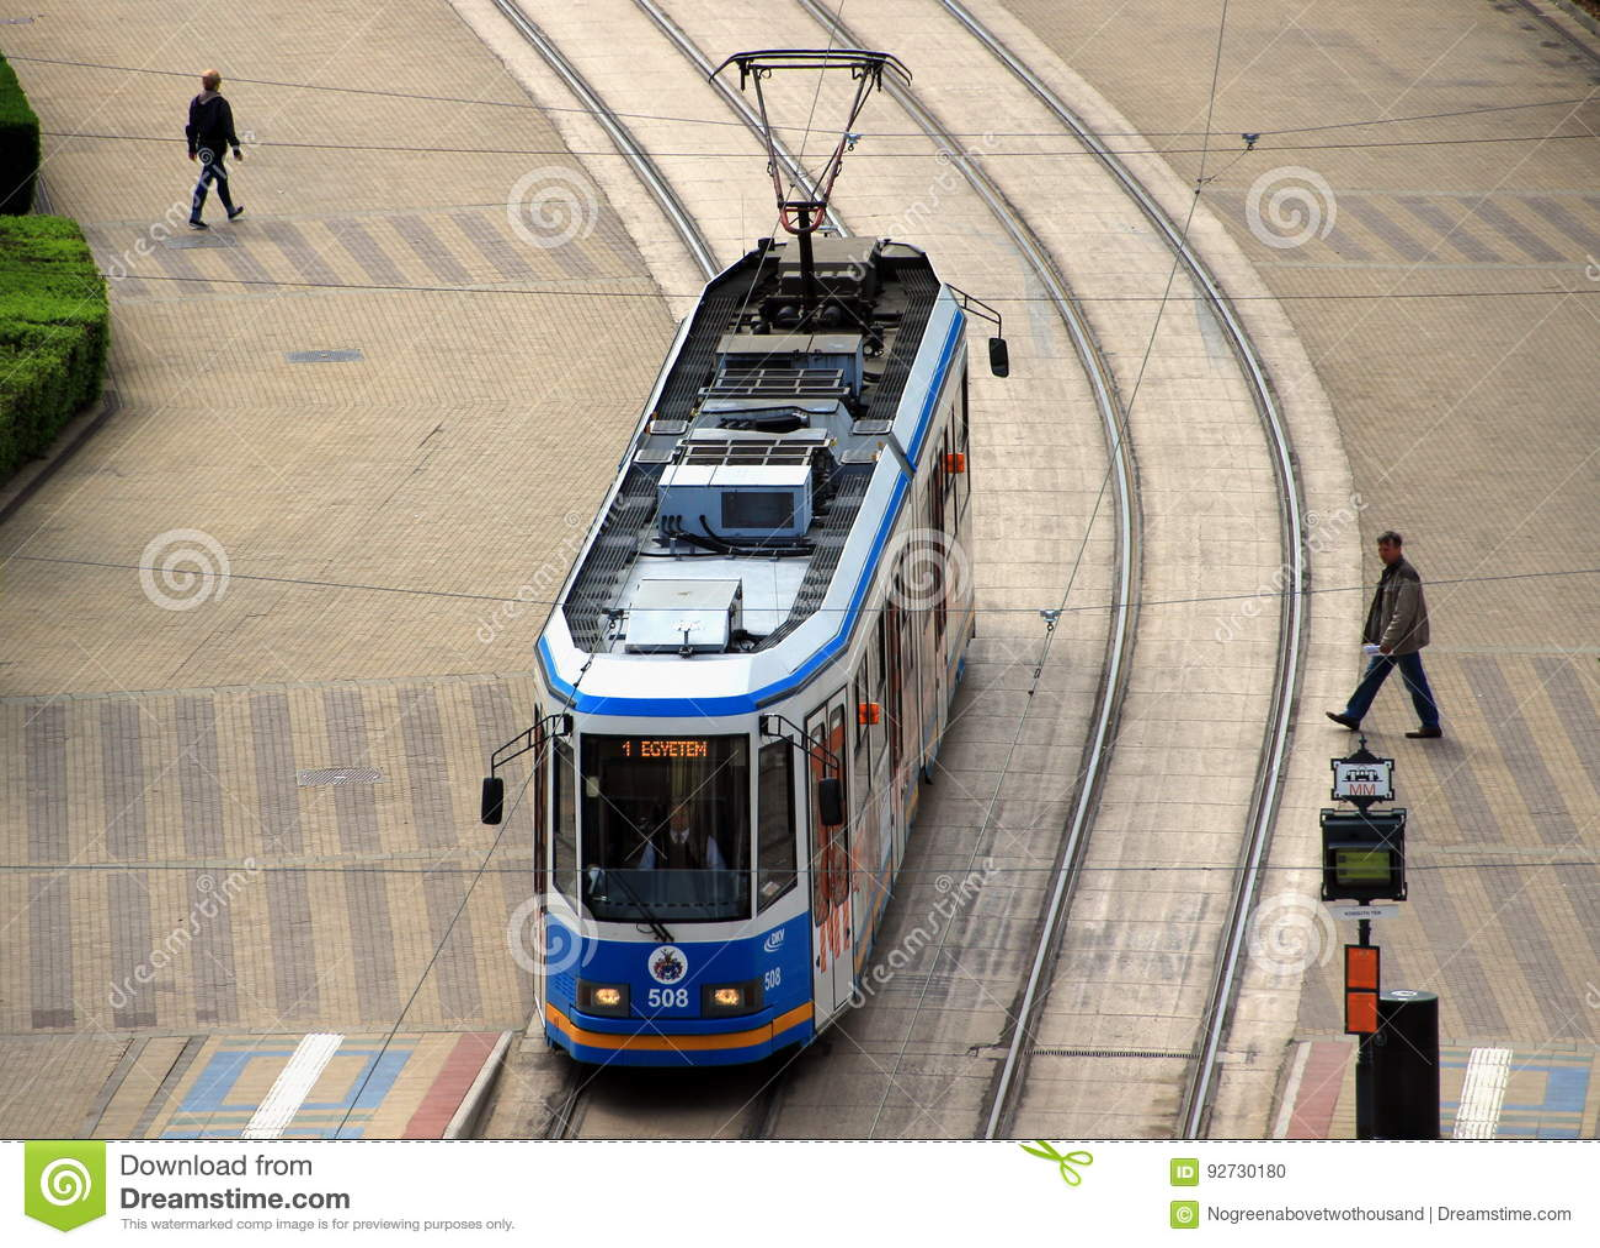 Moderne Ganz-tram in Debrecen, Hongarije